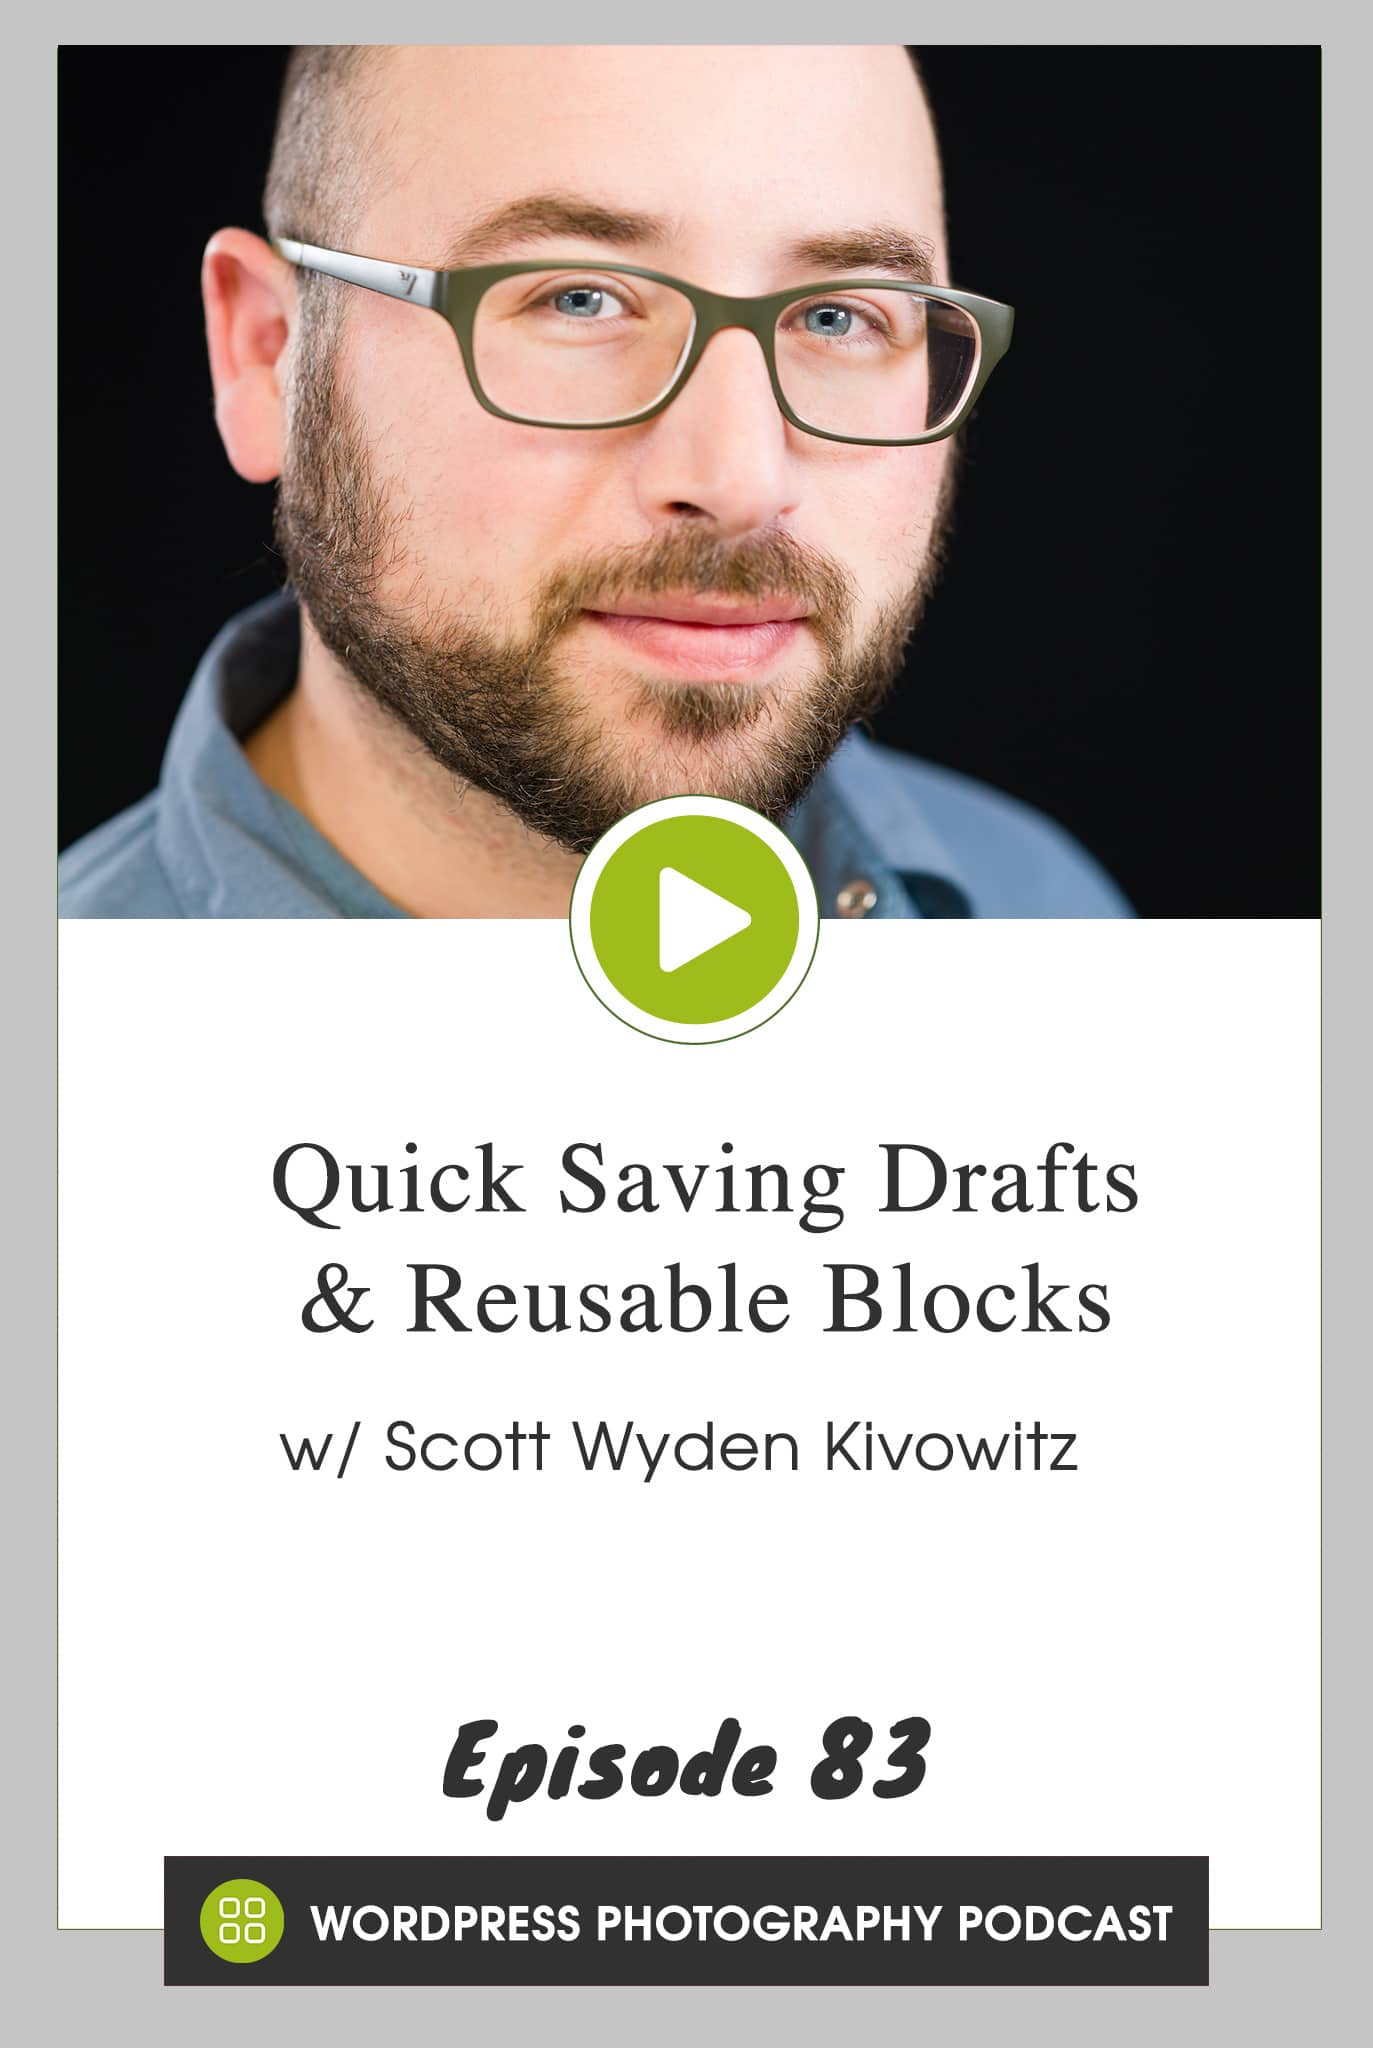 Episode 83 – Quick Saving Drafts & Reusable Blocks